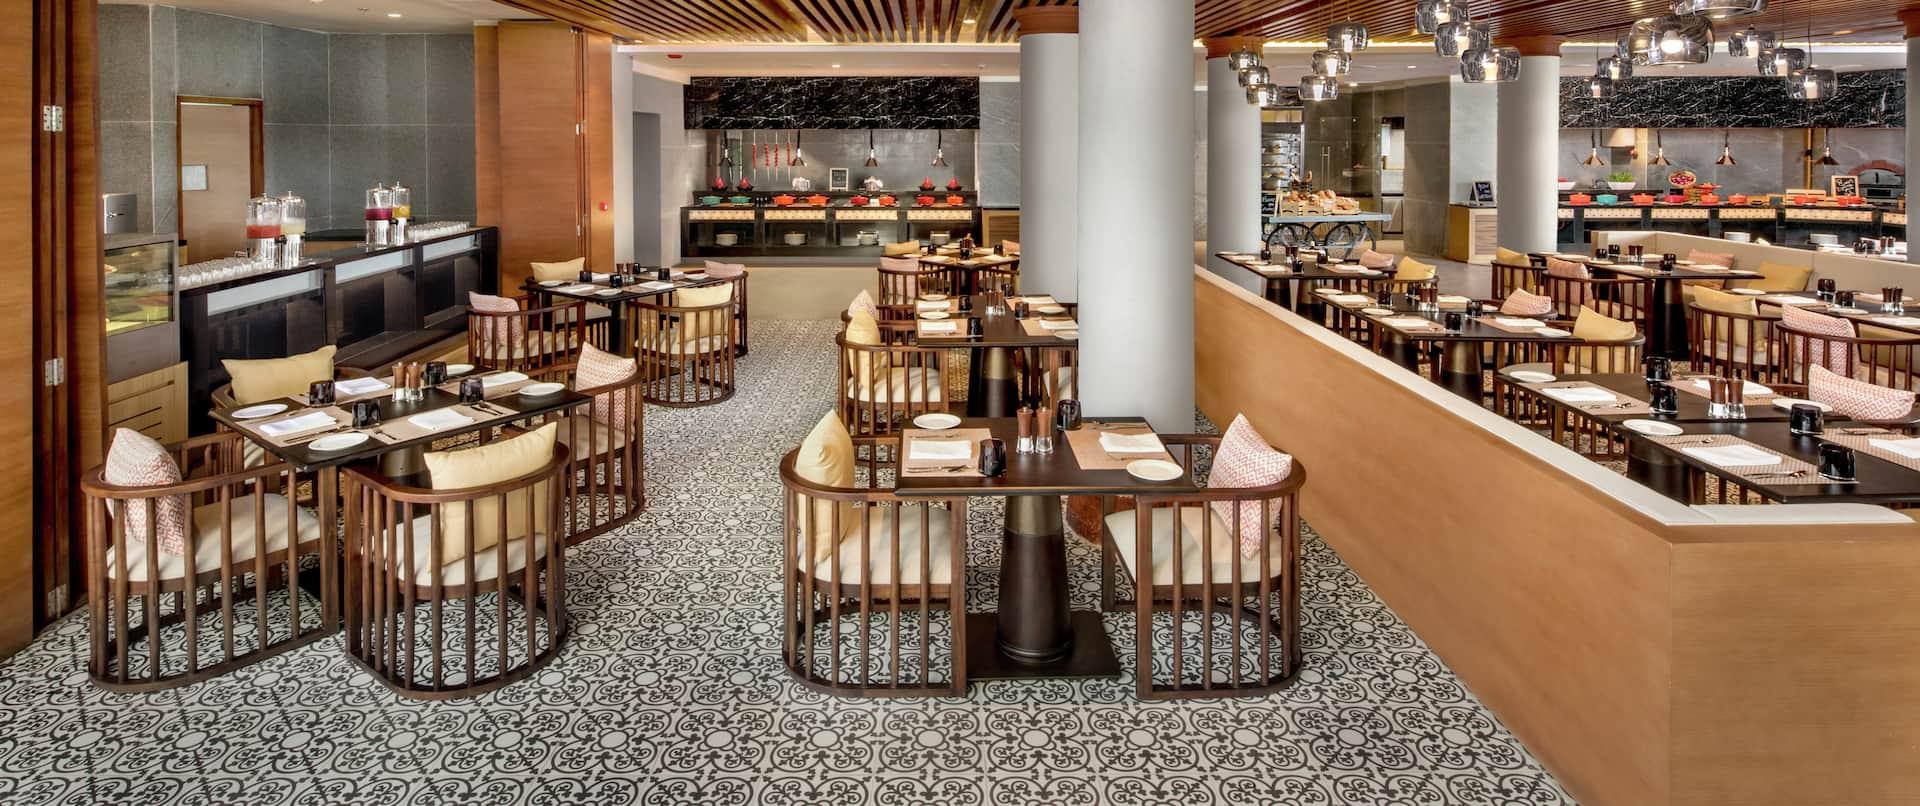 All day-dining restaurant - Comida